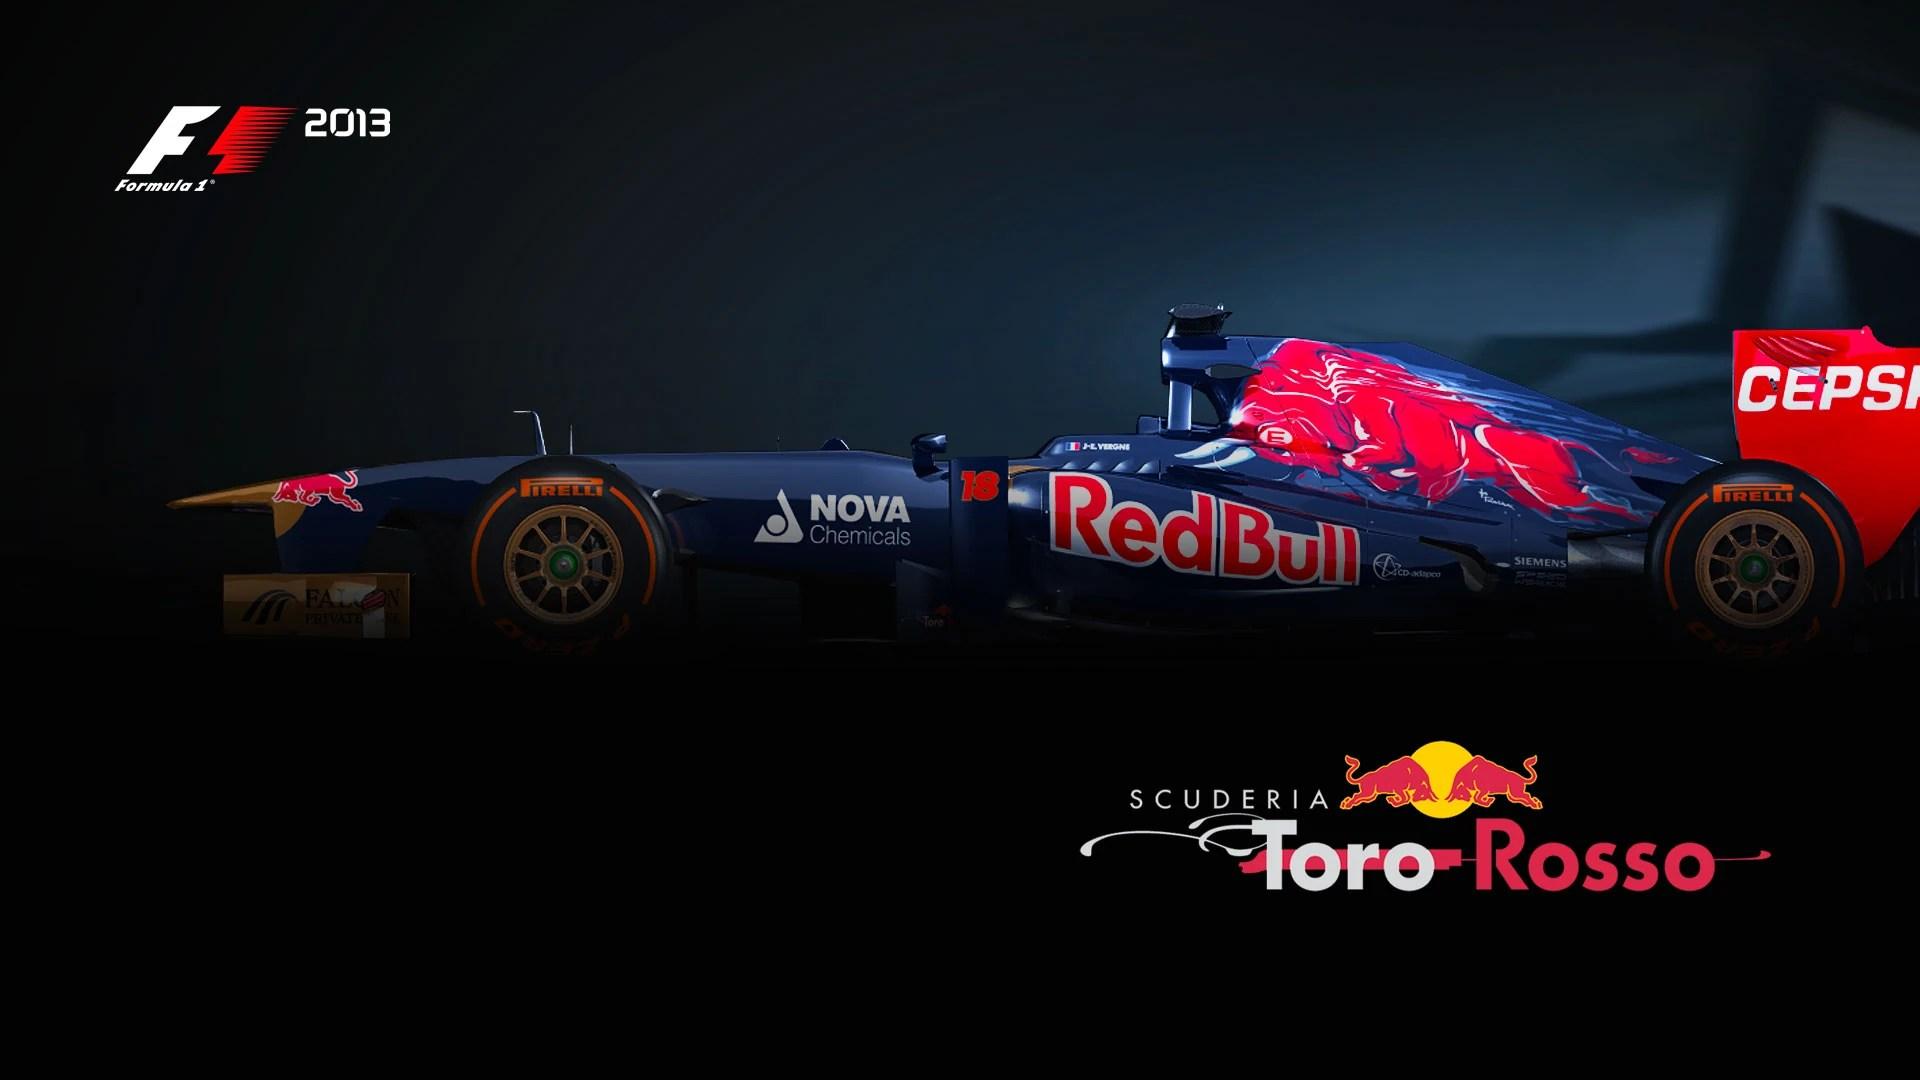 Red Bull Wallpaper Hd Iphone F1 2013 Scuderia Toro Rosso Steam Trading Cards Wiki